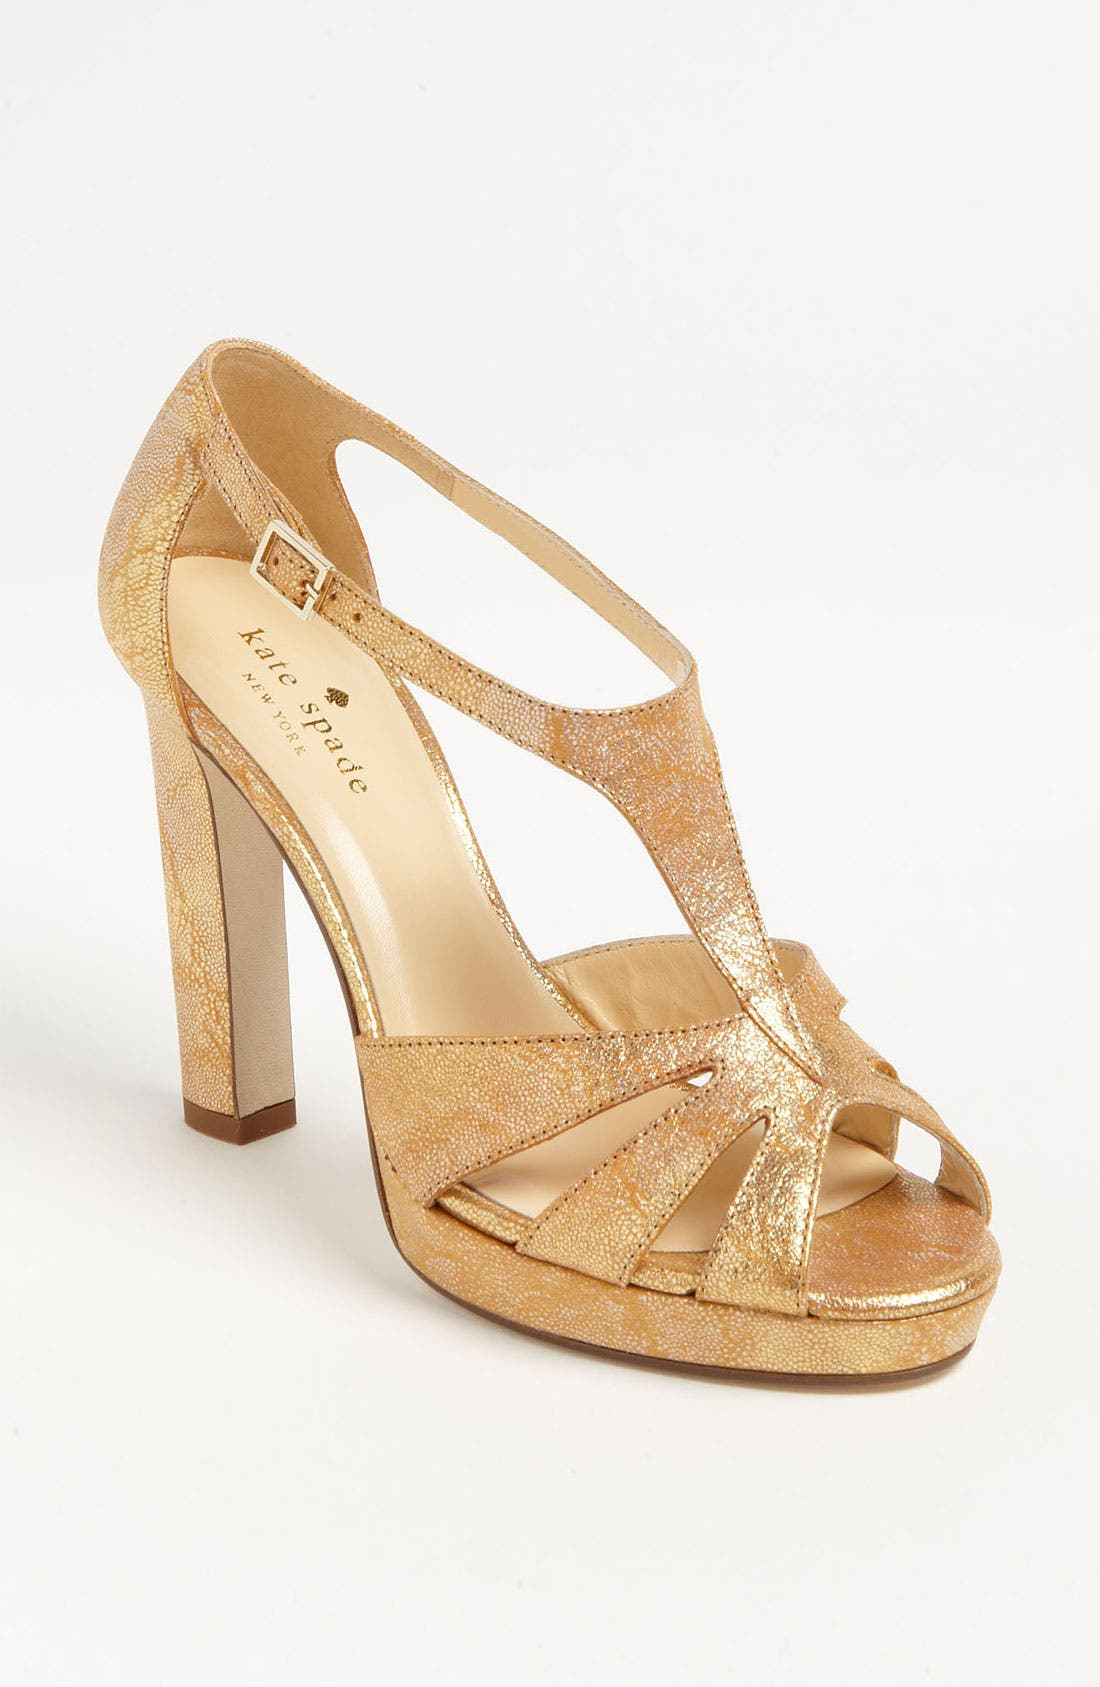 Main Image - kate spade new york 'ria' sandal